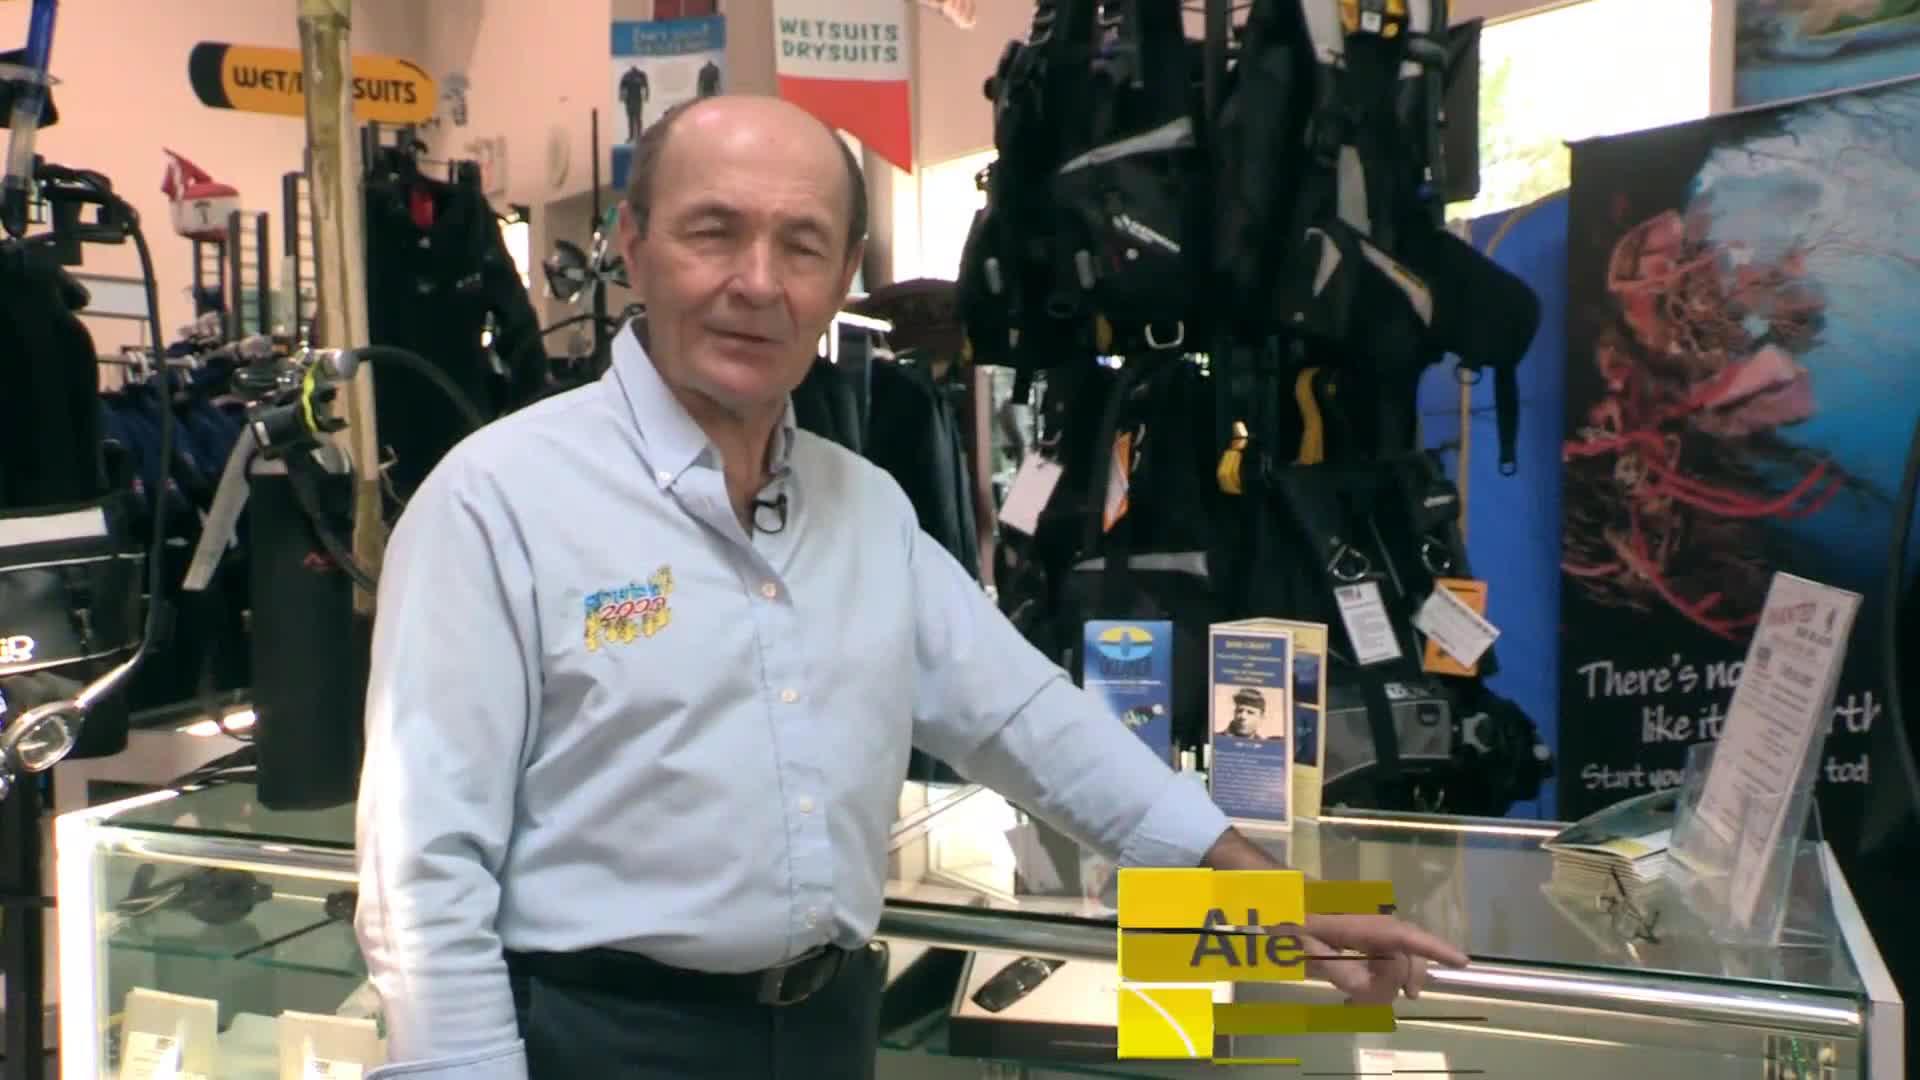 Scuba 2000 - Diving Lessons & Equipment - 905-771-1500